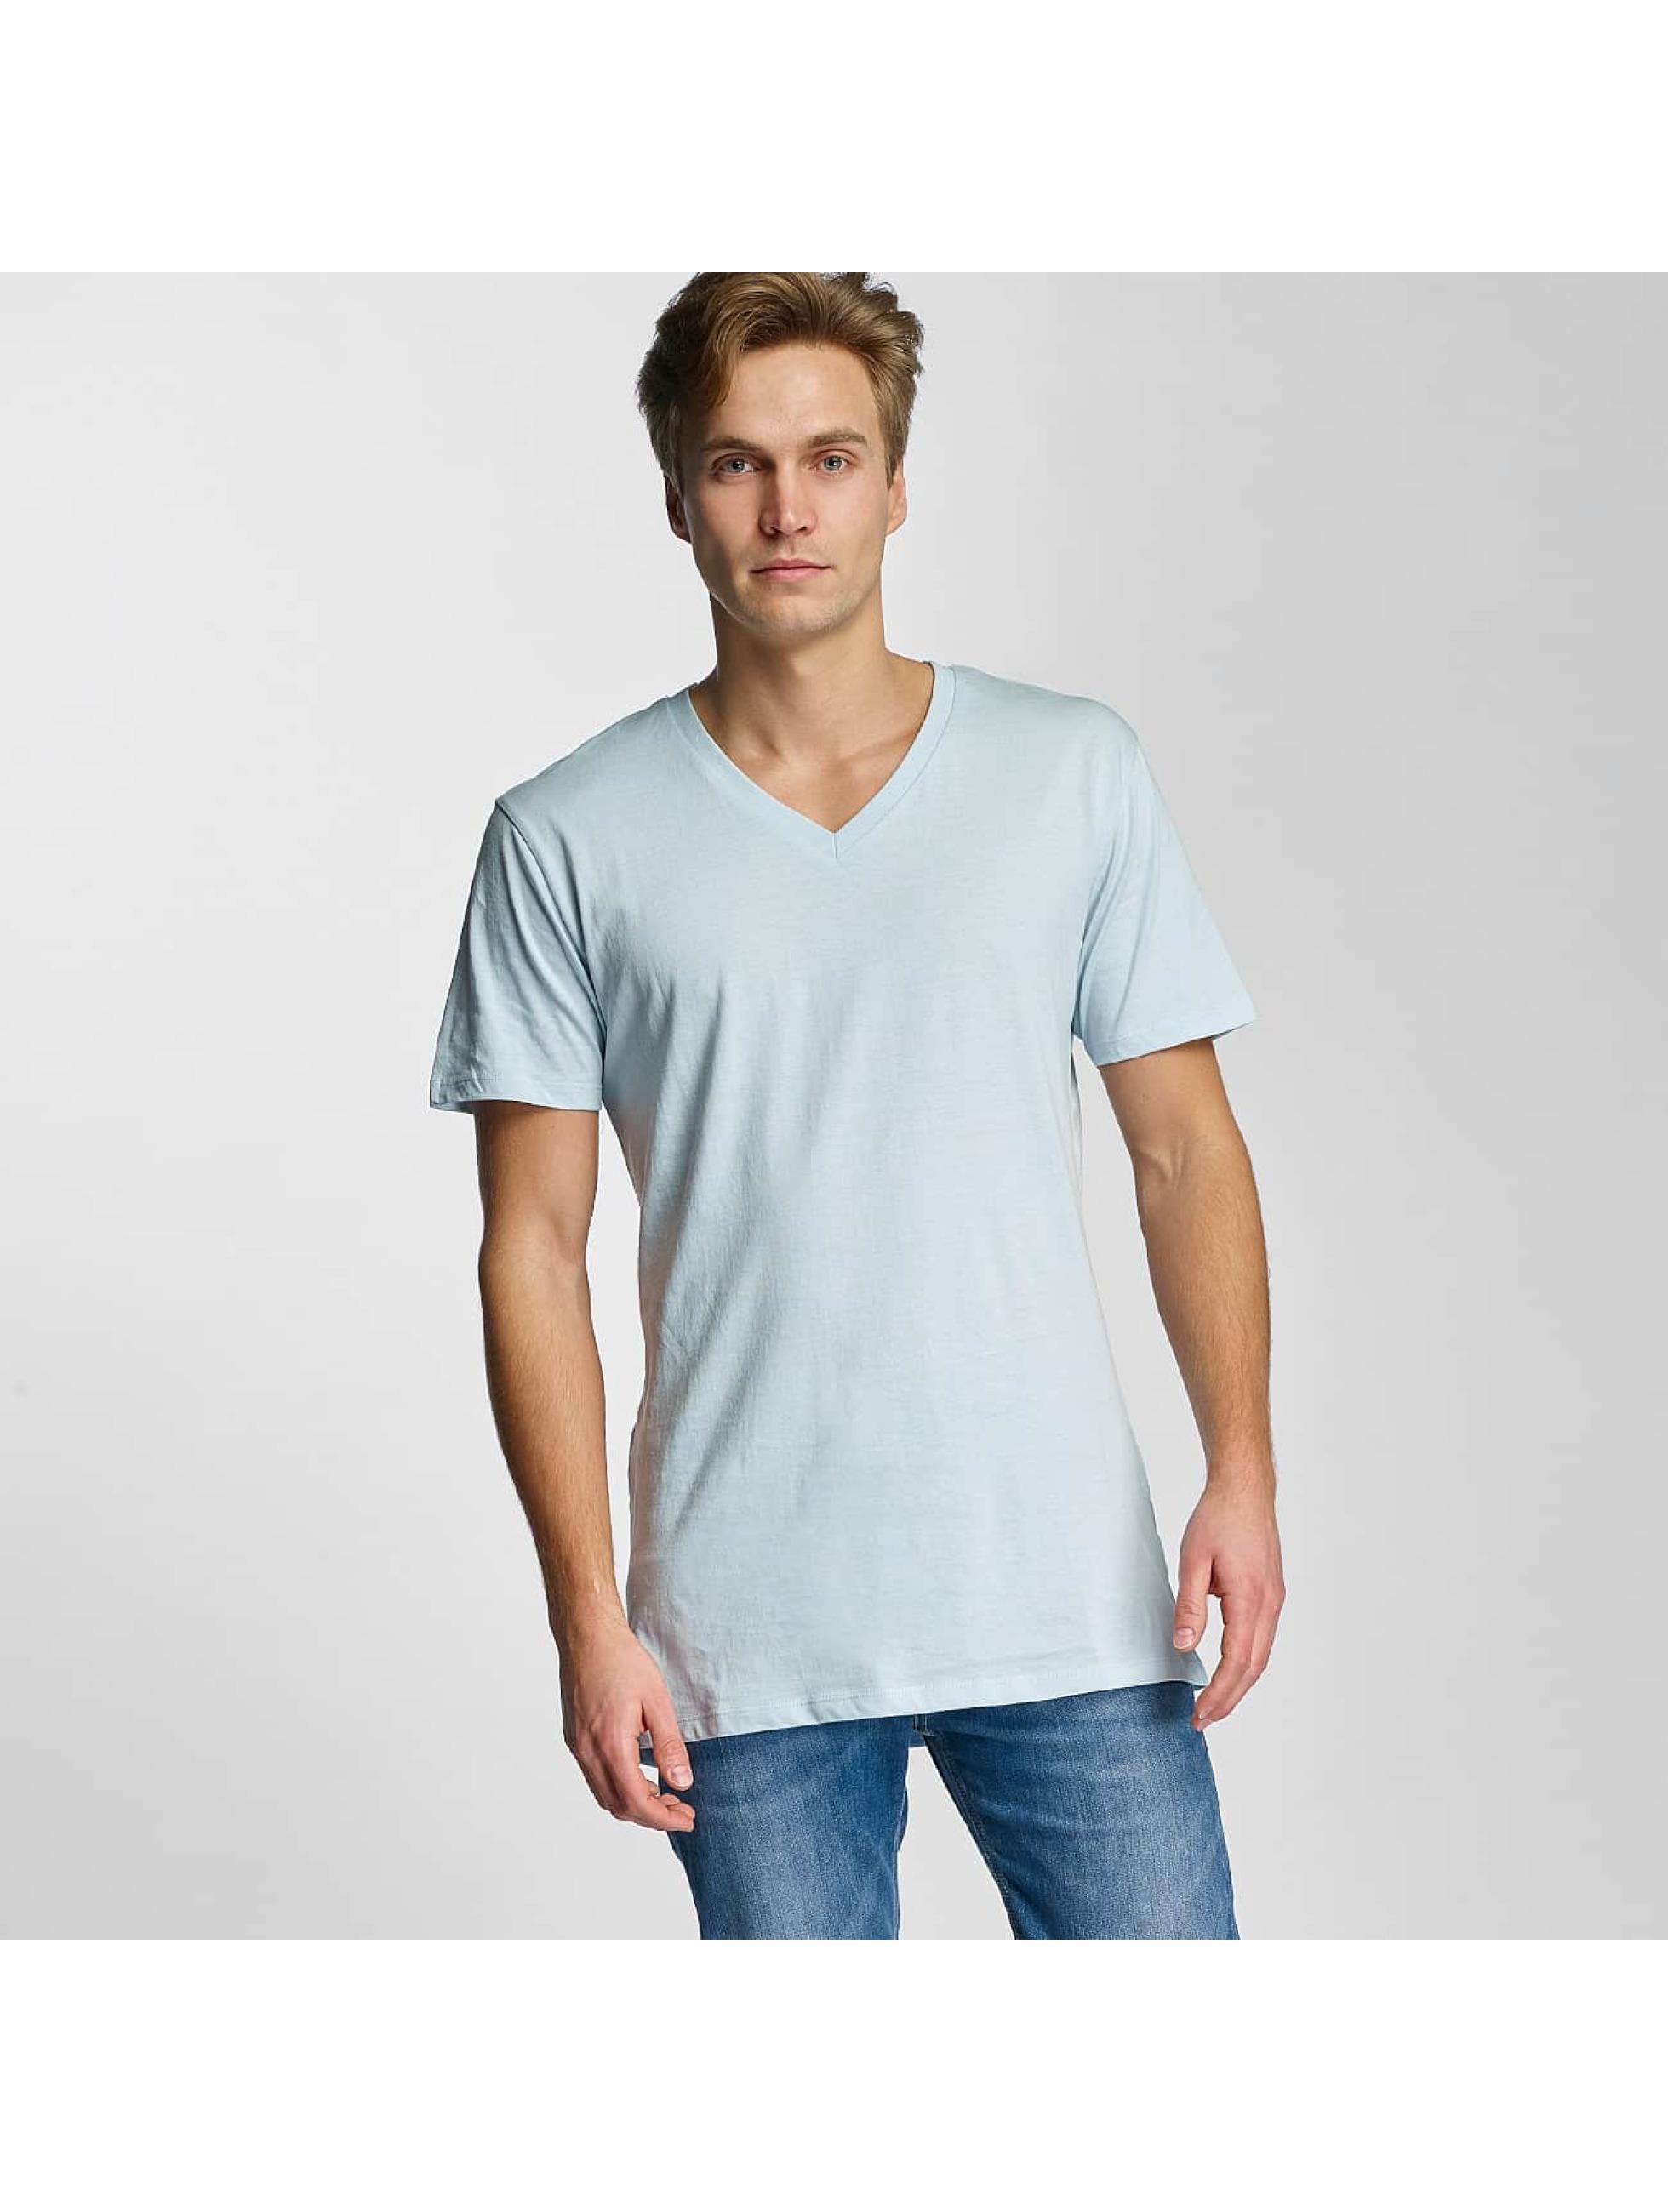 Urban Classics T-Shirt Basic V-Neck blue